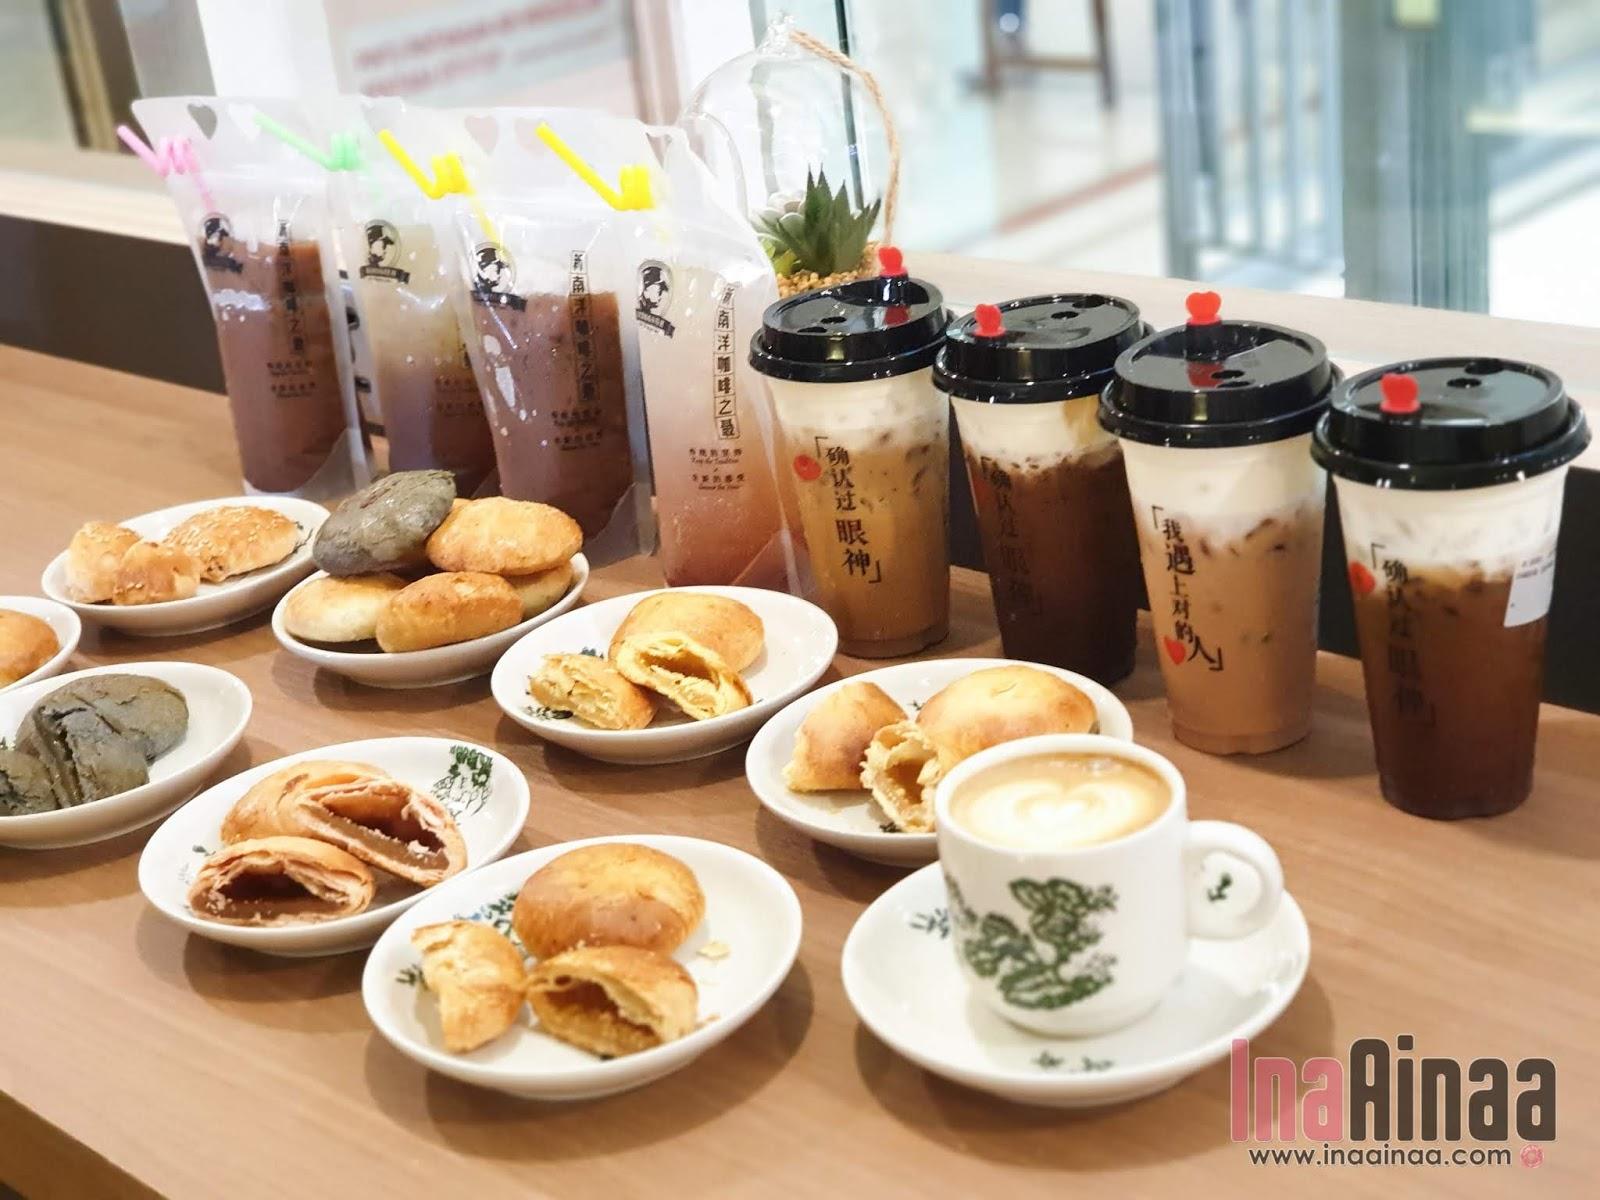 OLDMASTER NEW-NANYANG COFFEE- Hak Milik Ina Ainaa